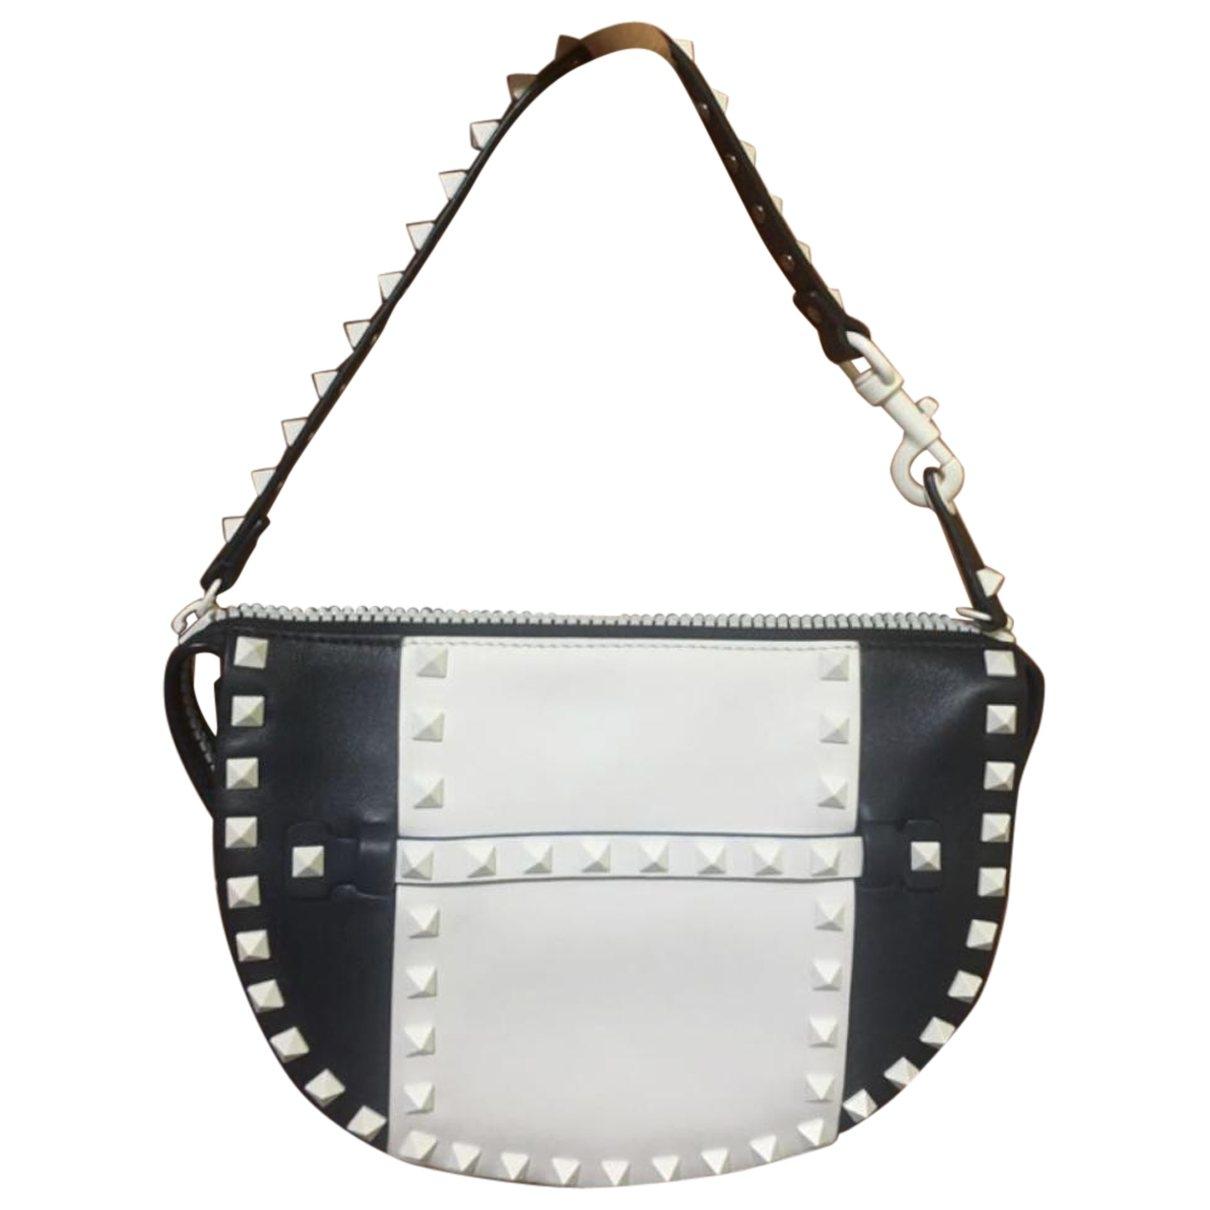 Valentino Garavani Rockstud Handtasche in  Bunt Leder